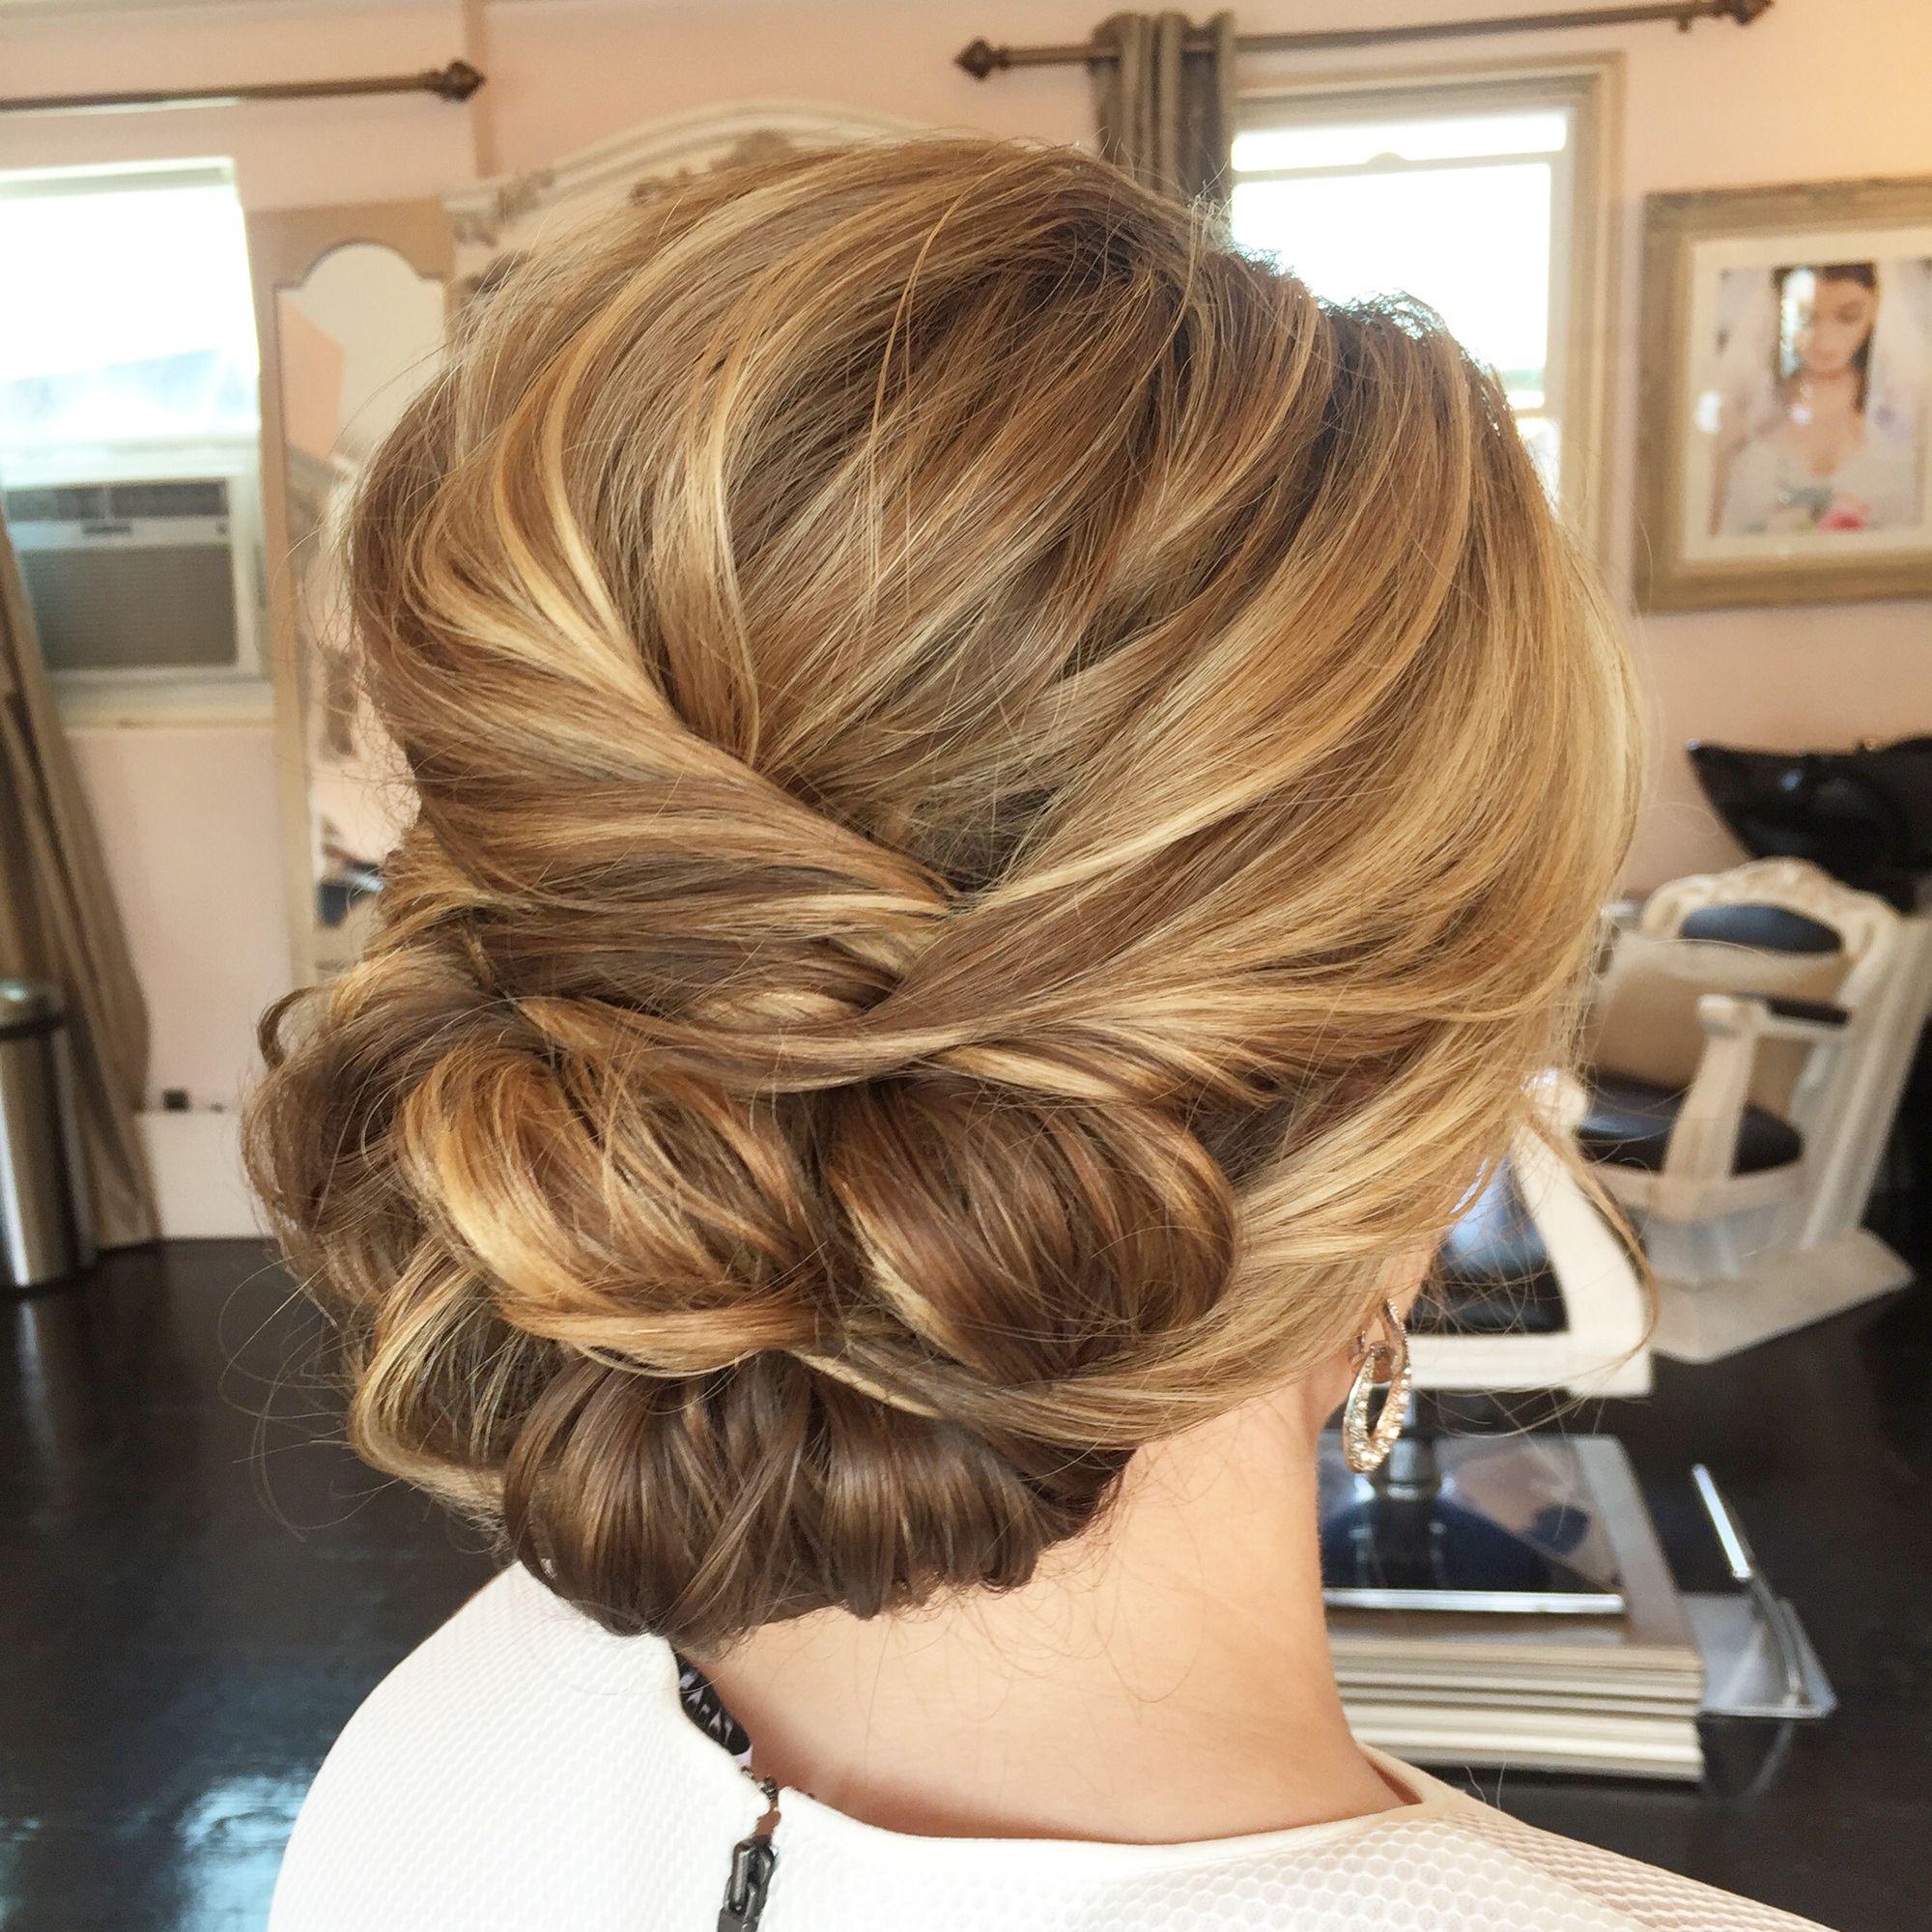 Bridal trial done in our laguna beach bridal salon by dee we also